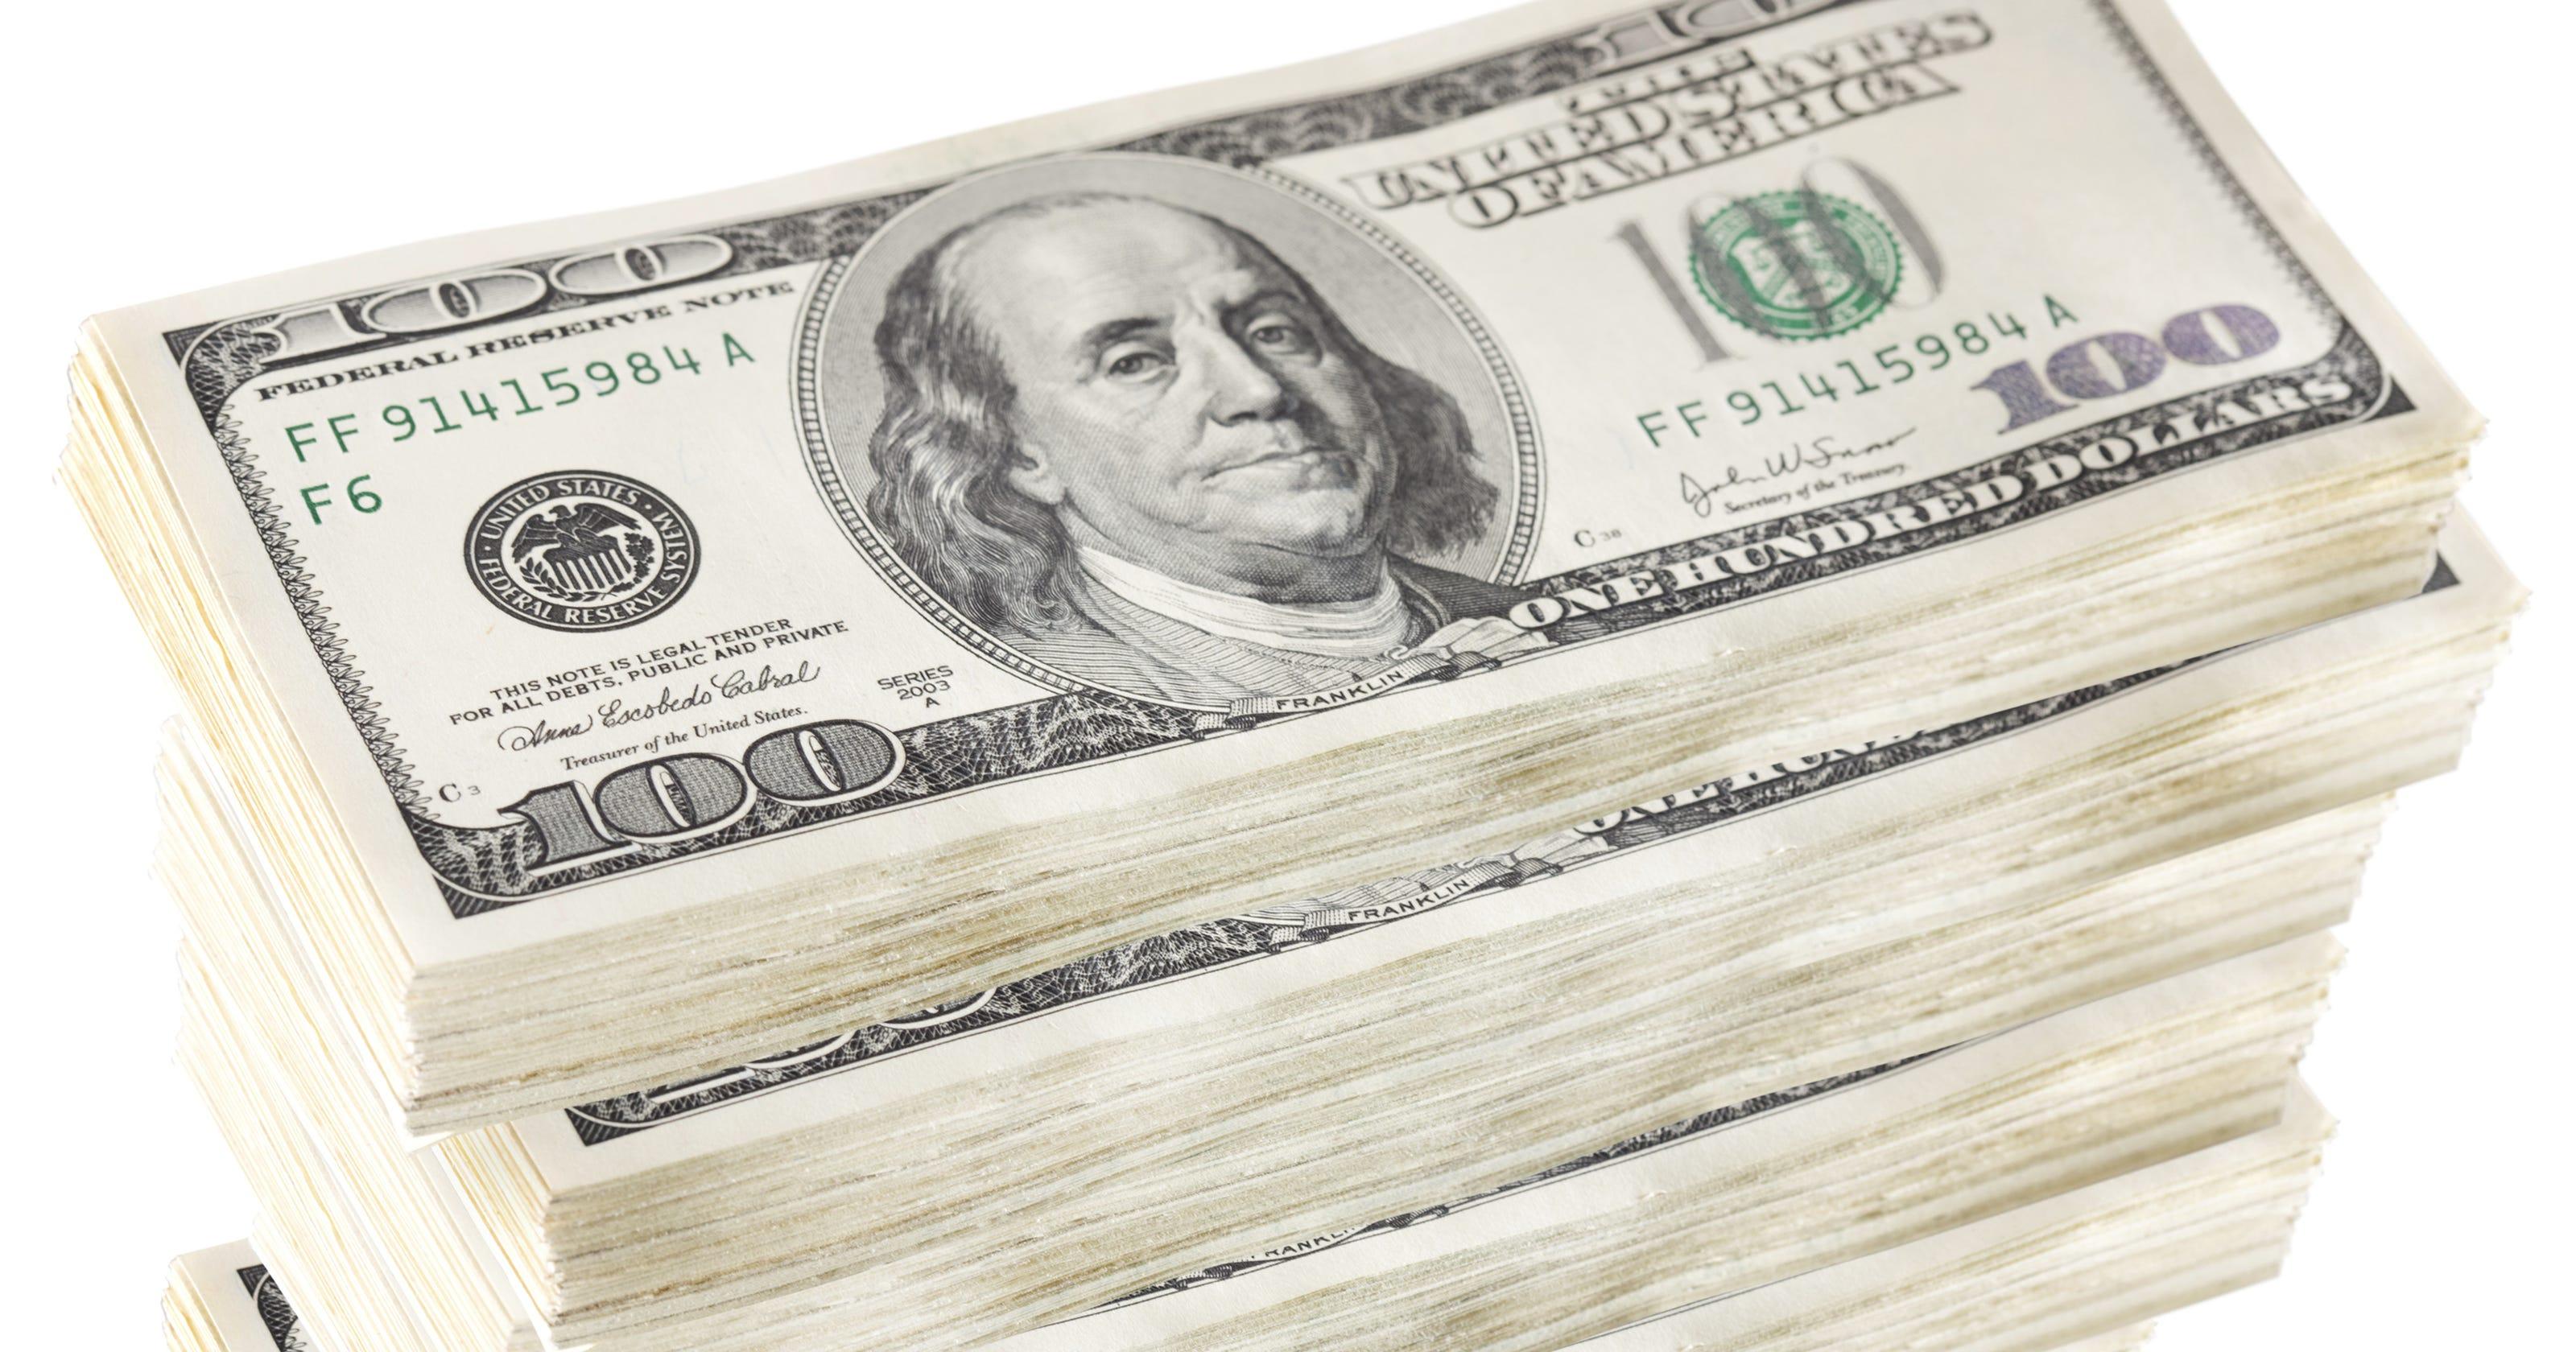 Unclaimed funds: Clinton, Goodell still owed some of billions